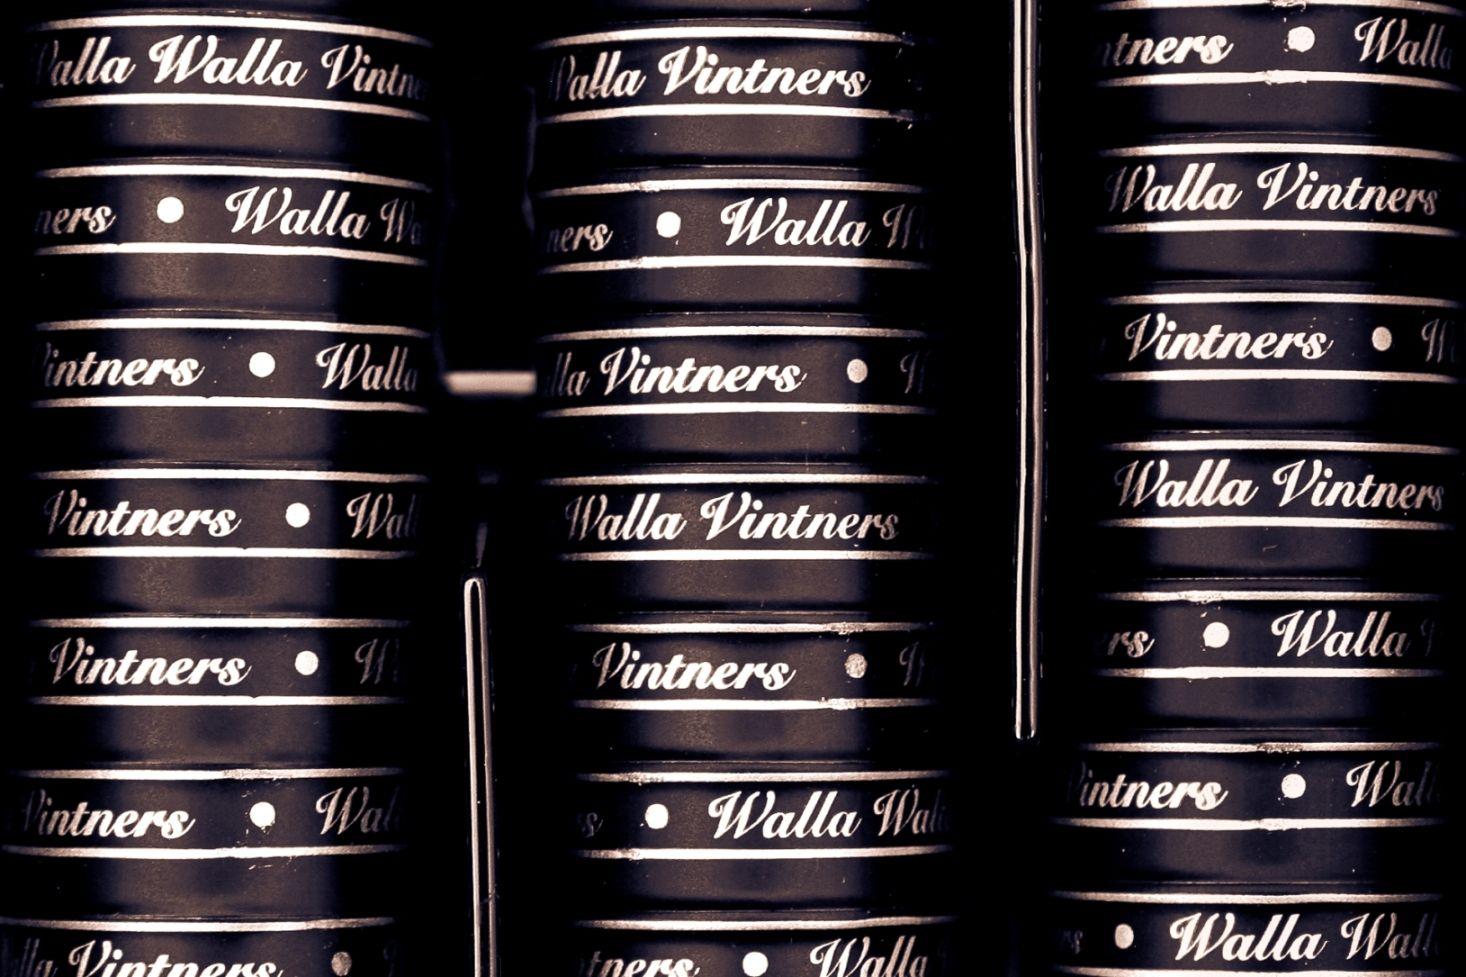 Walla Walla Vintner foils ready to go on bottles.